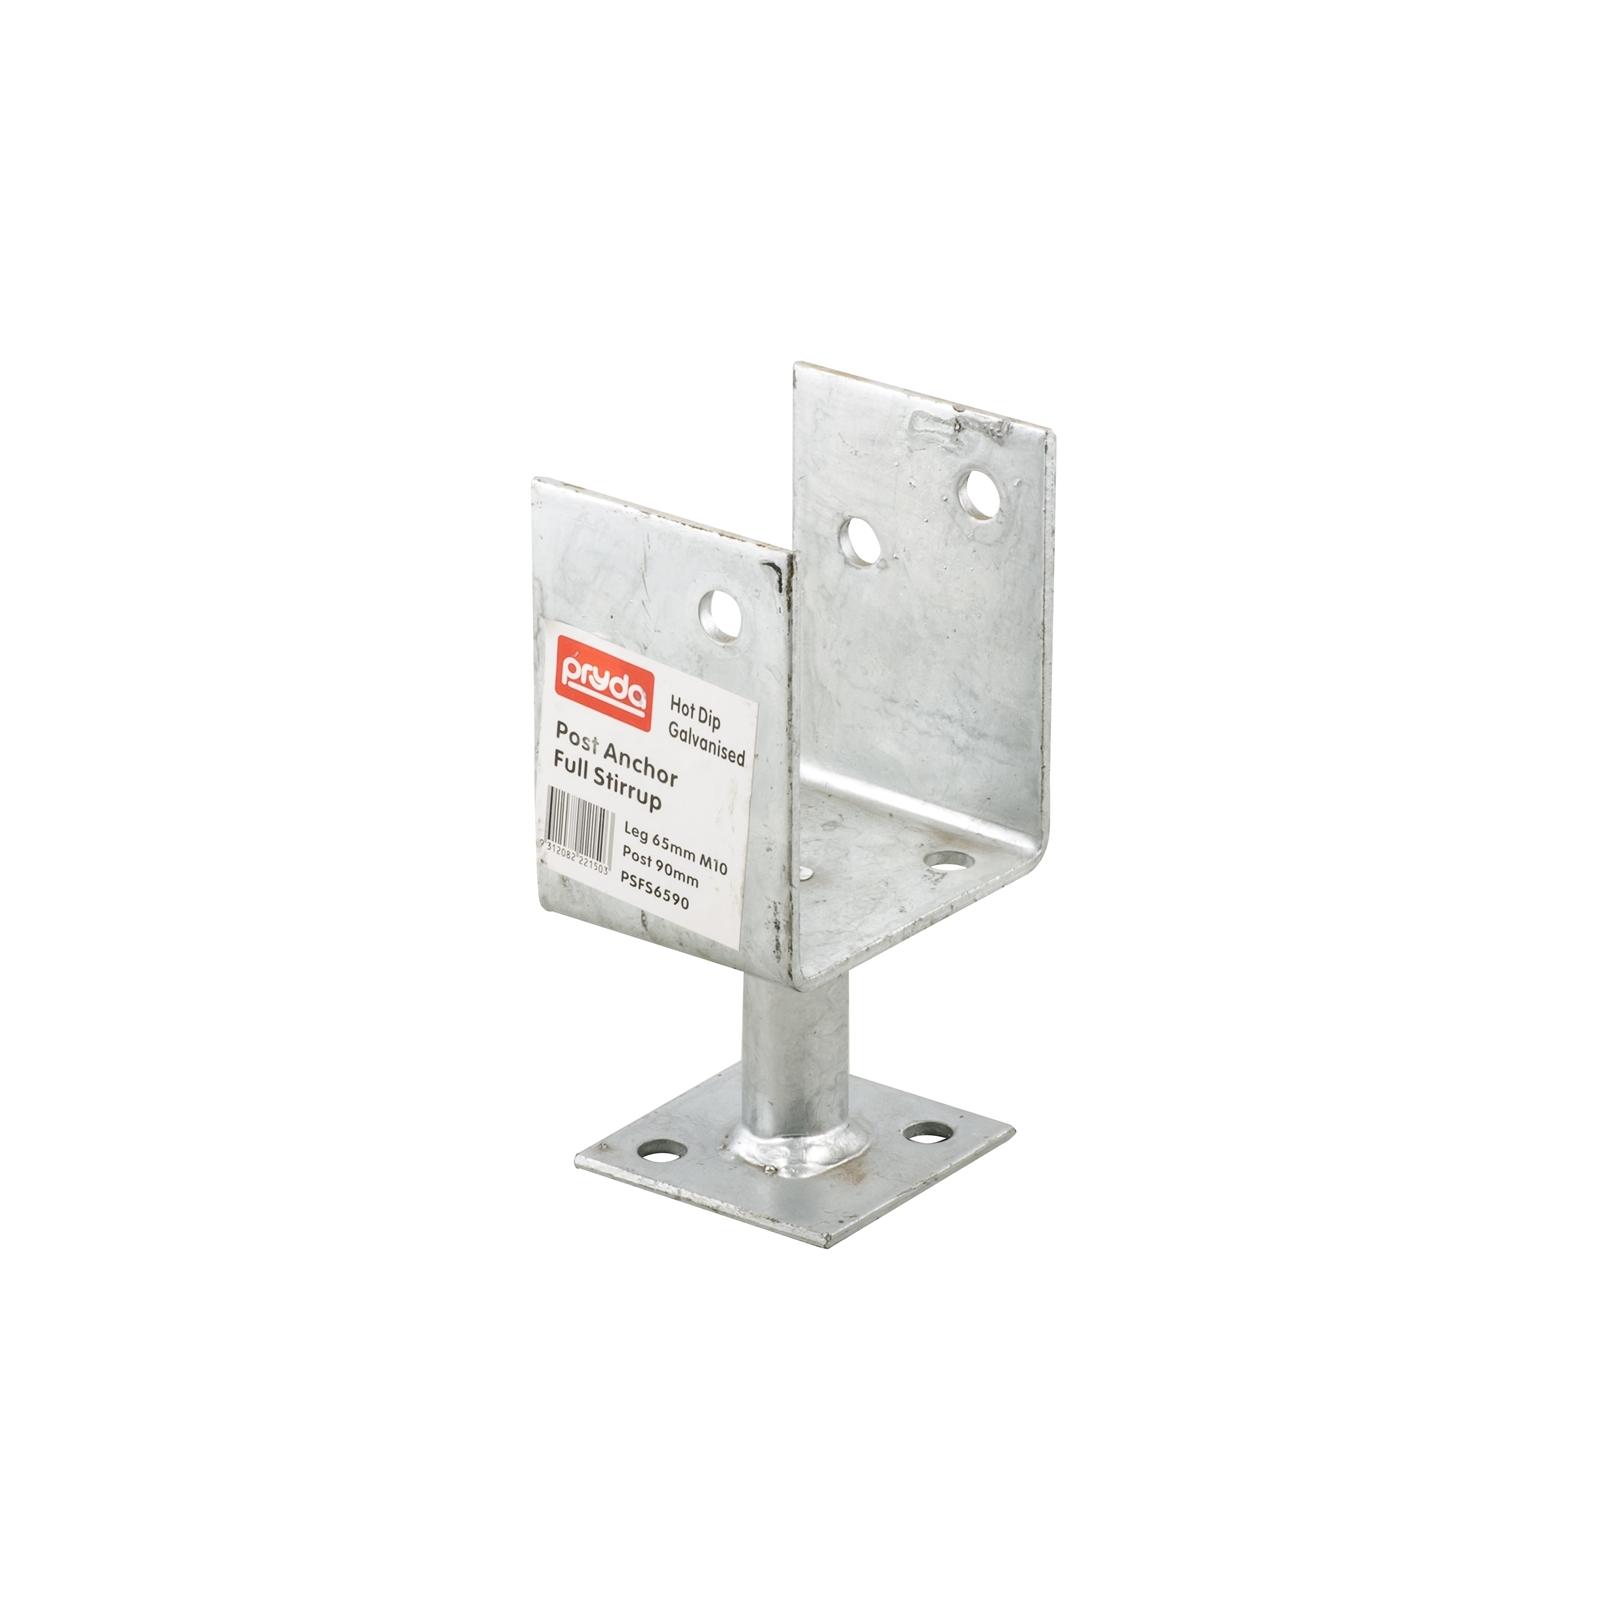 Pryda Post Anchor Full Stirrup 65 x 90mm M10